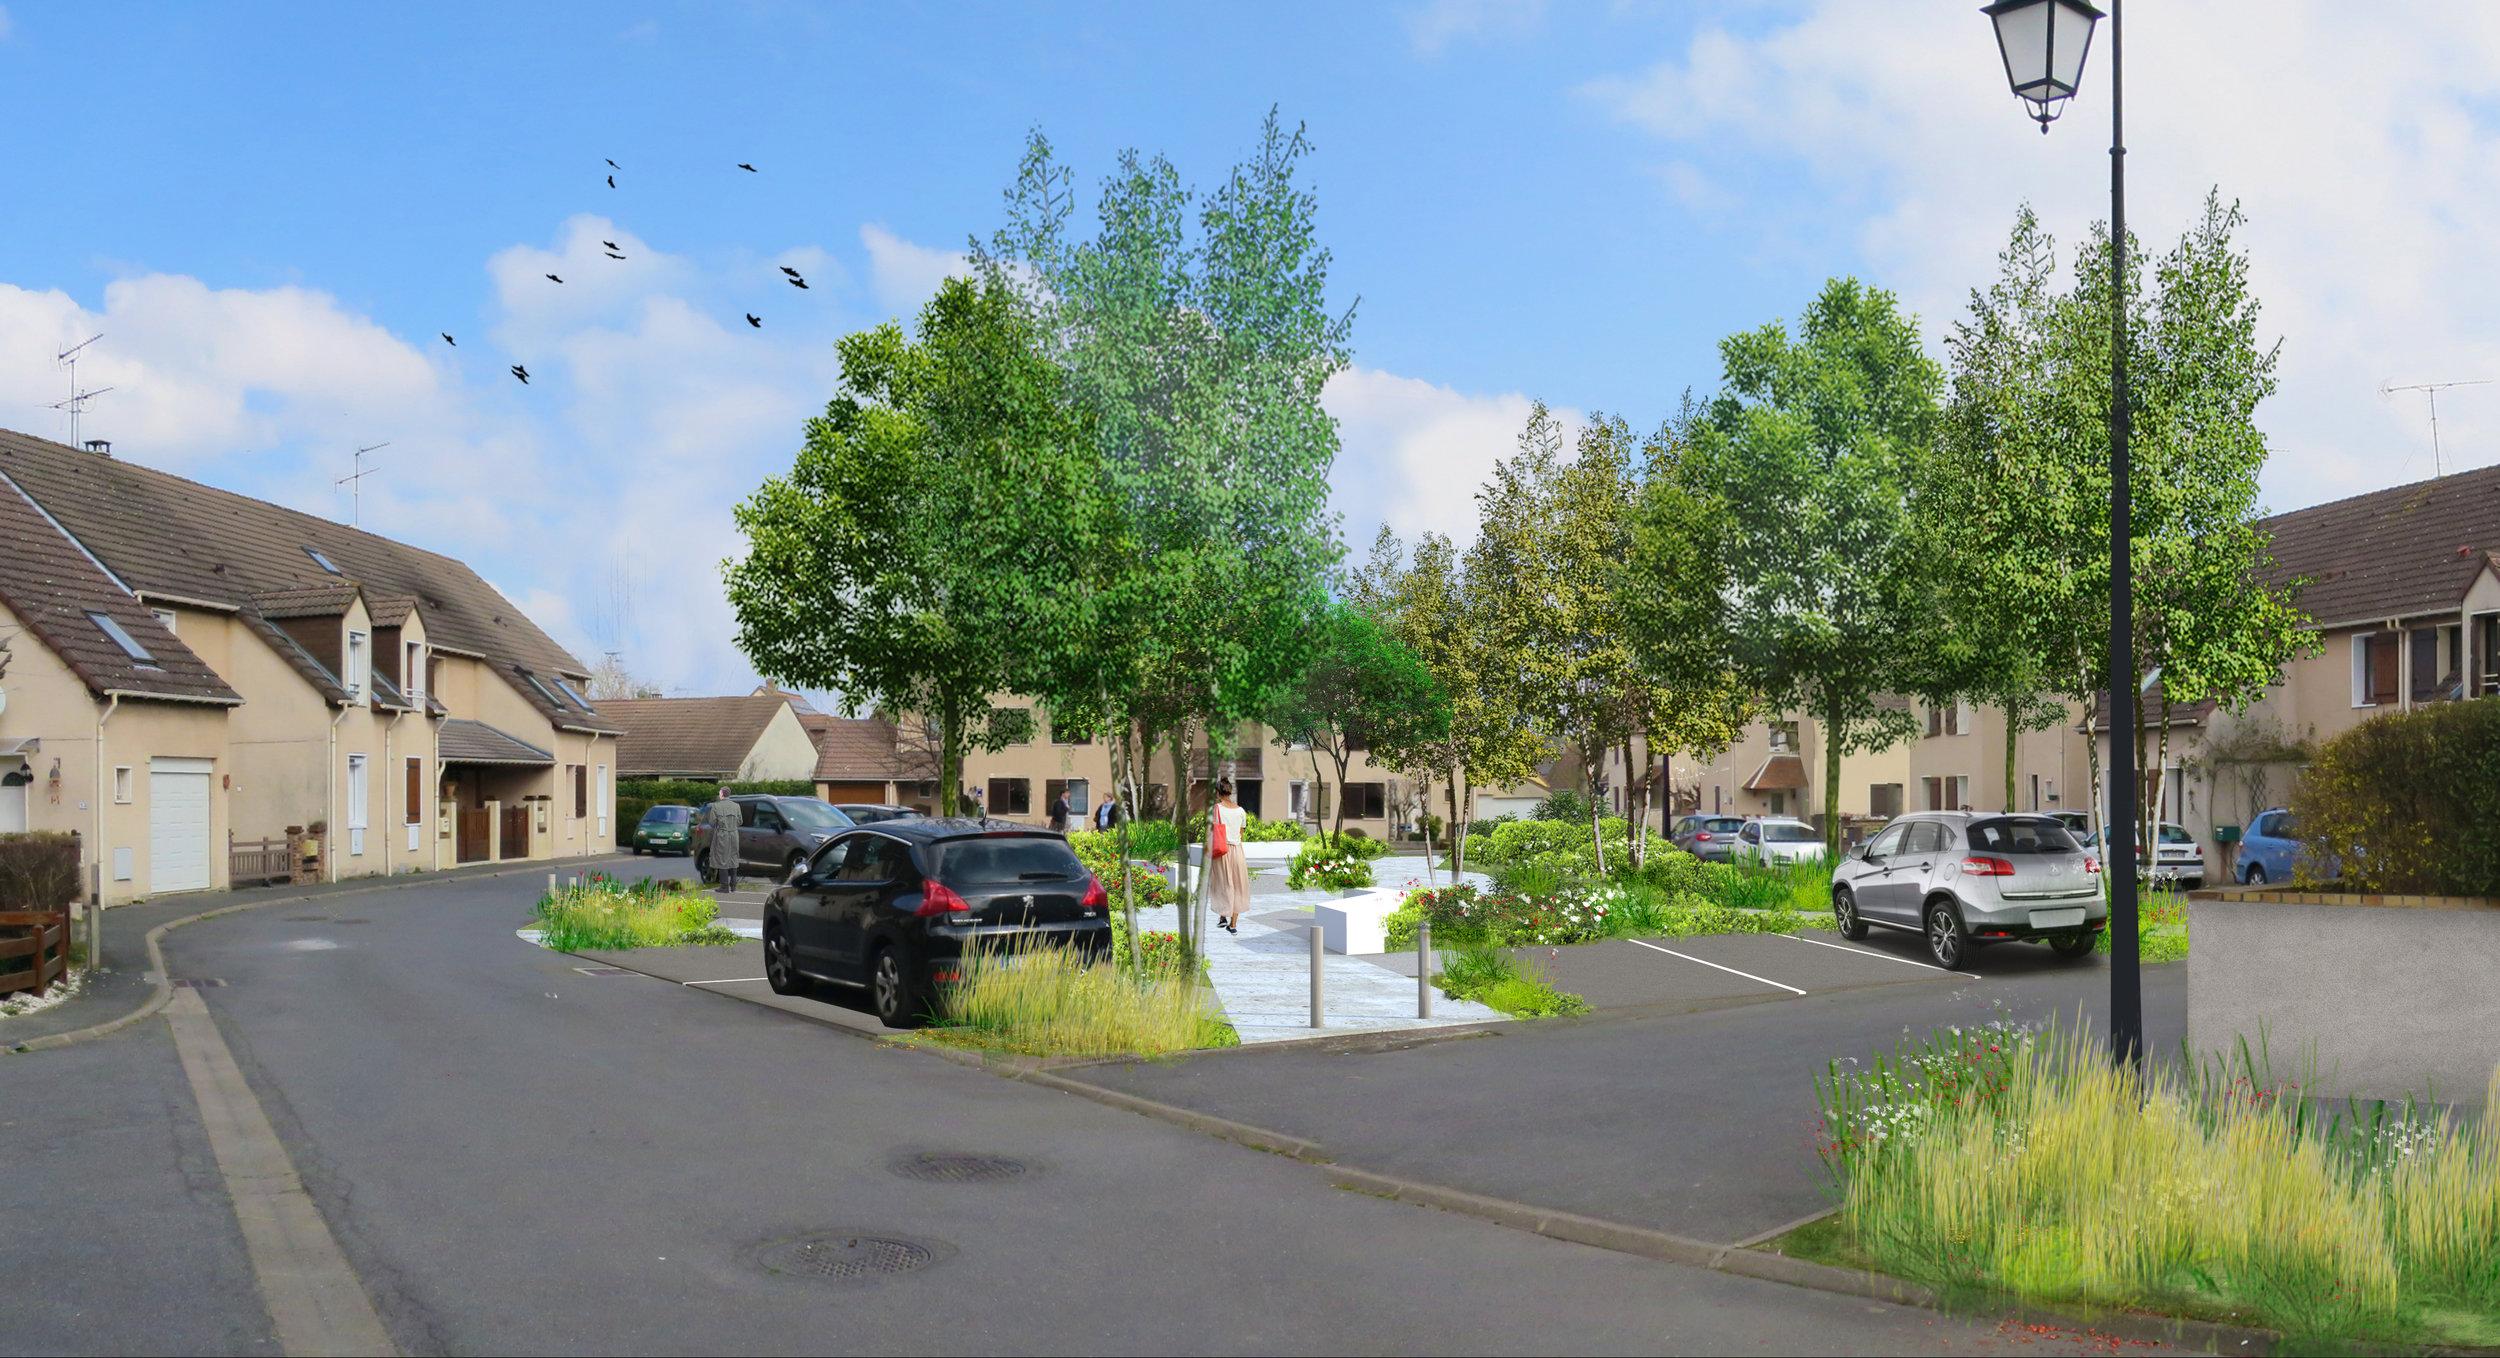 public_square_maurecourt_terraces_gardens_outdoor_landscape_designer_christophe_gautrand_1.jpg